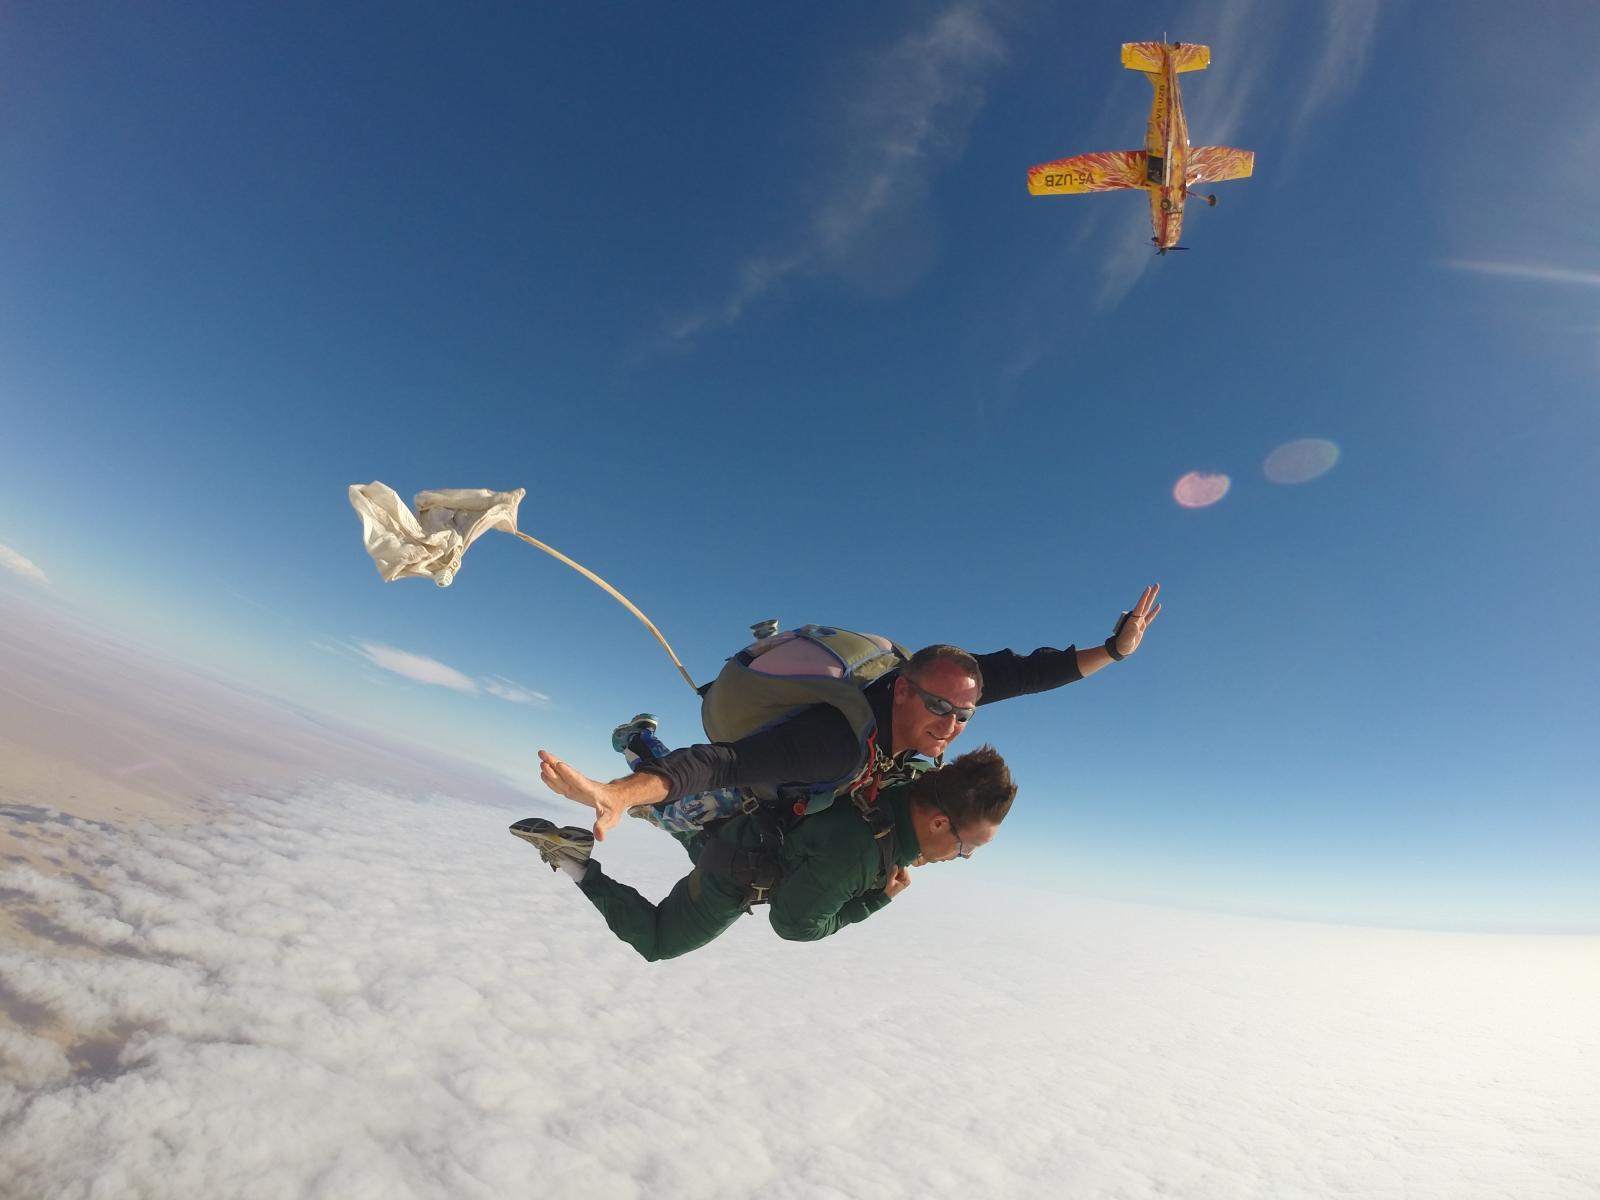 Ground Rush Adventures - Skydive in swakopmund today